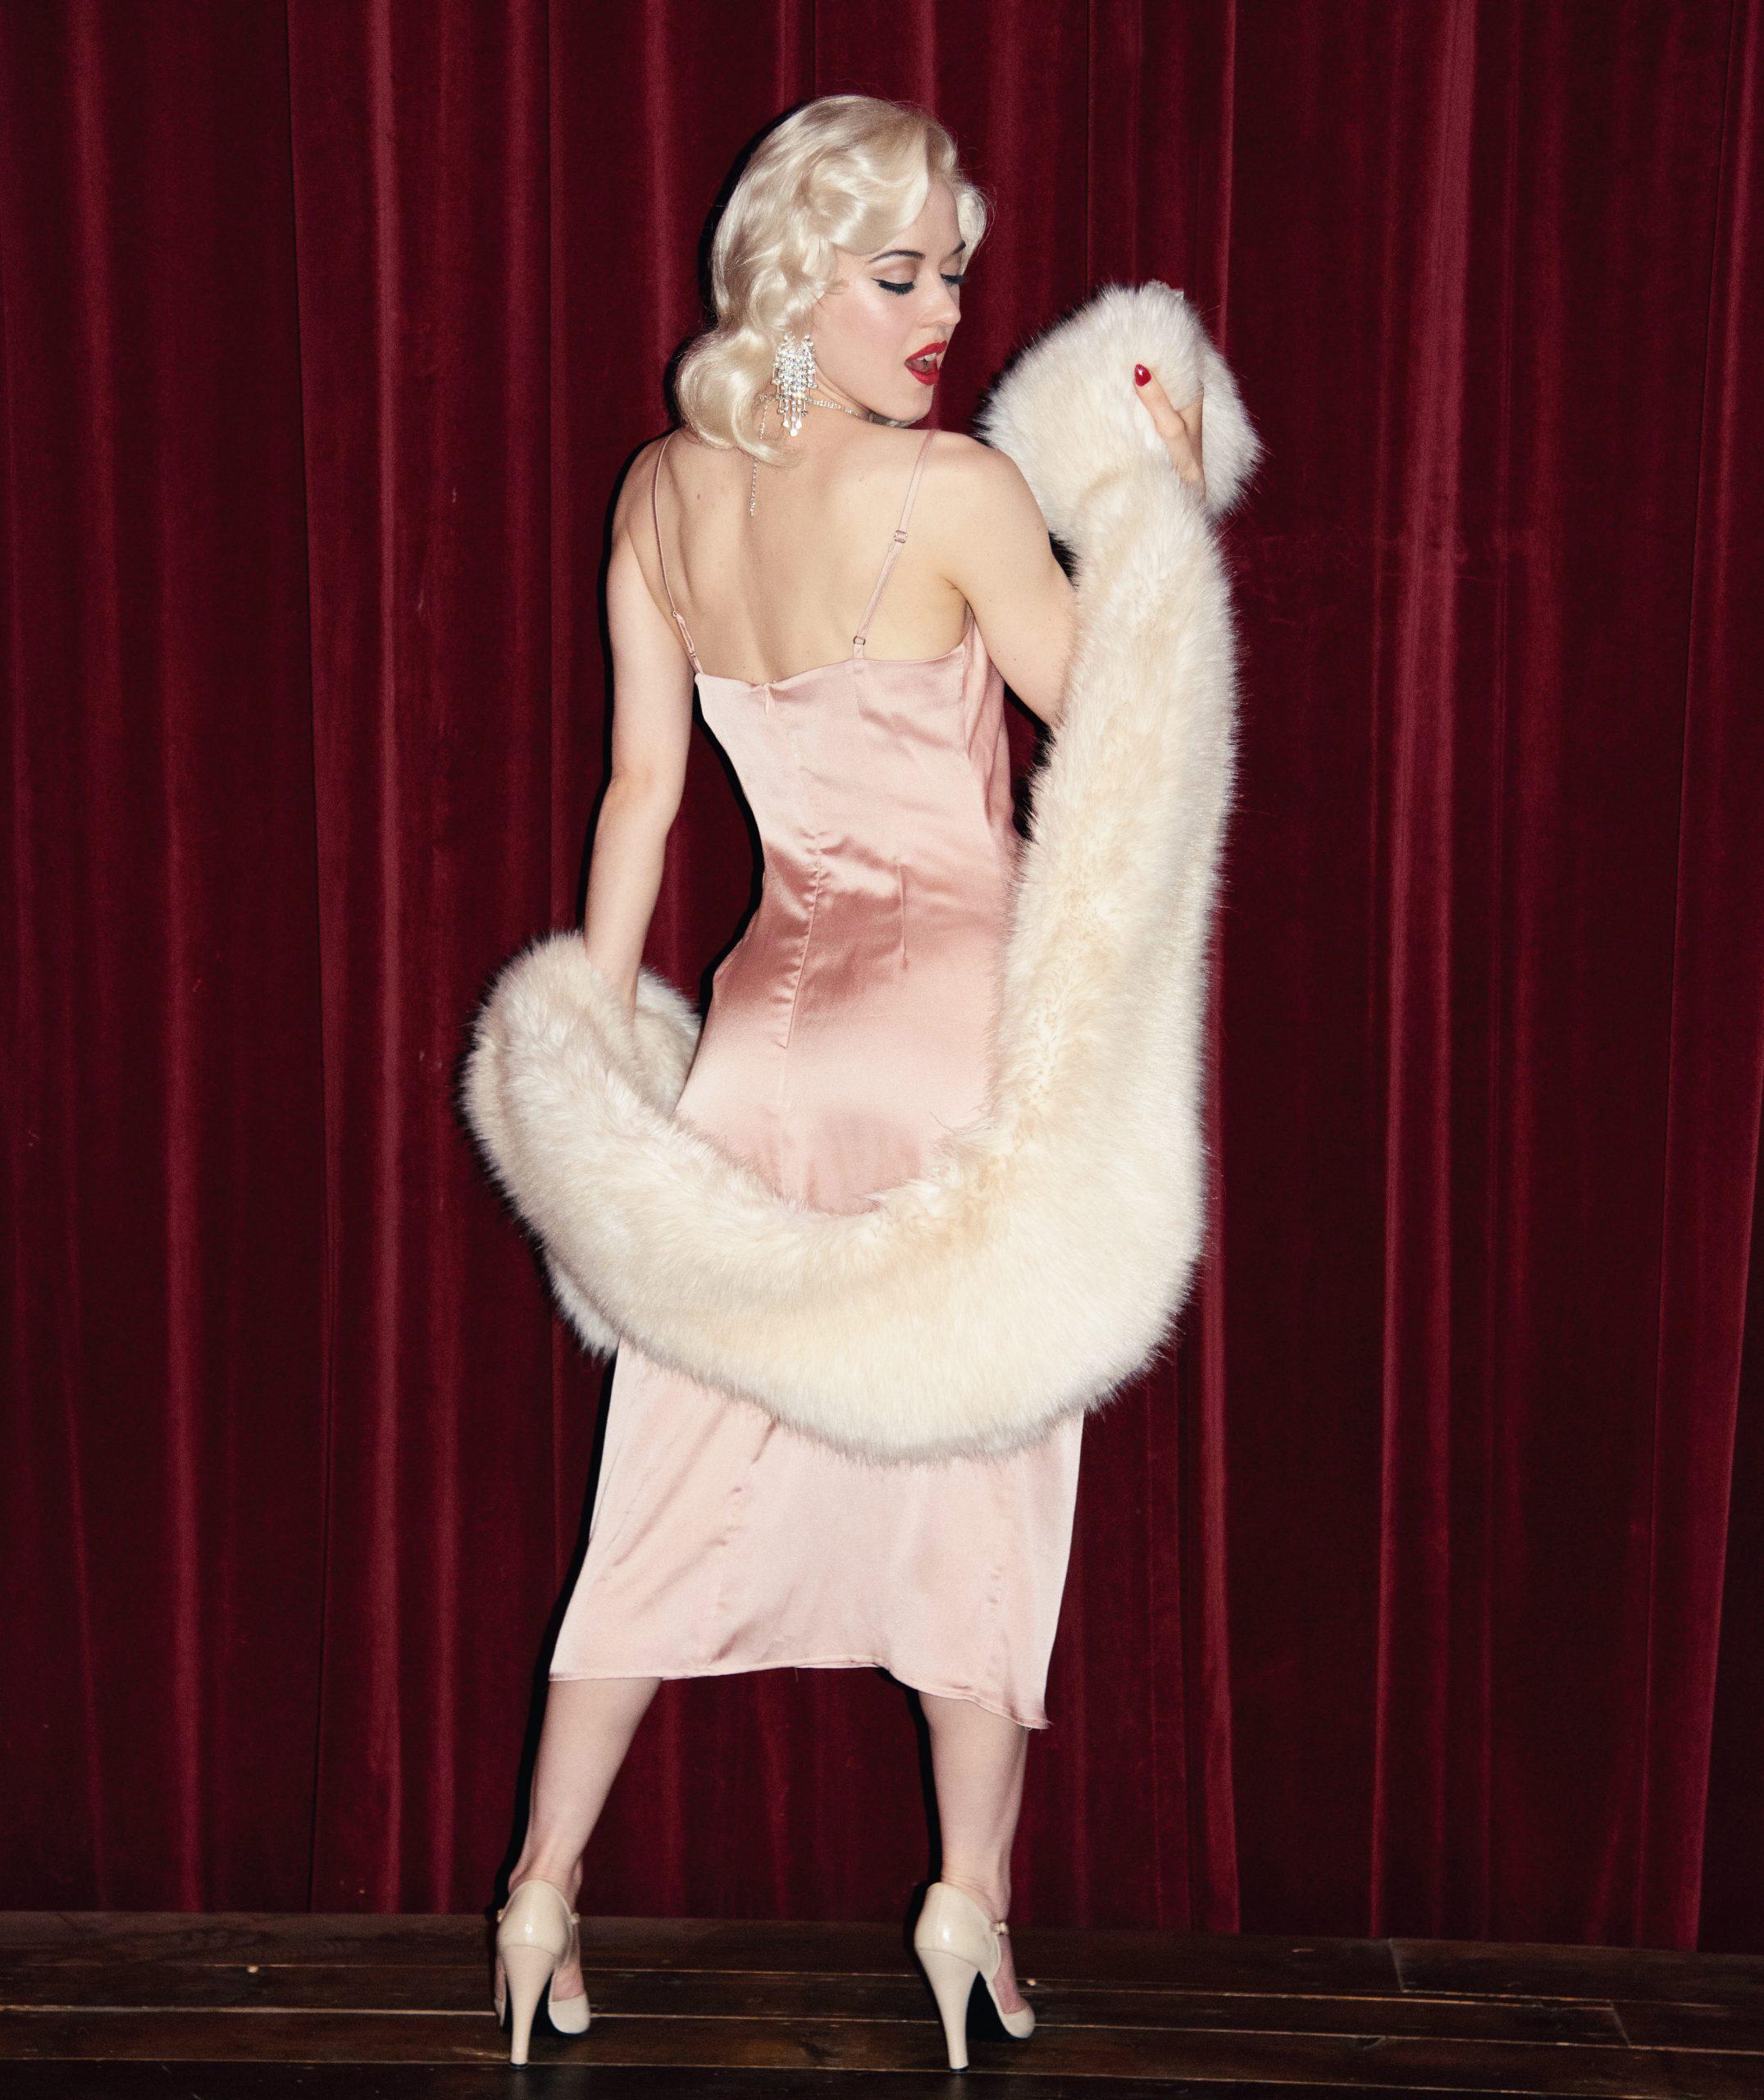 Prive burlesque show